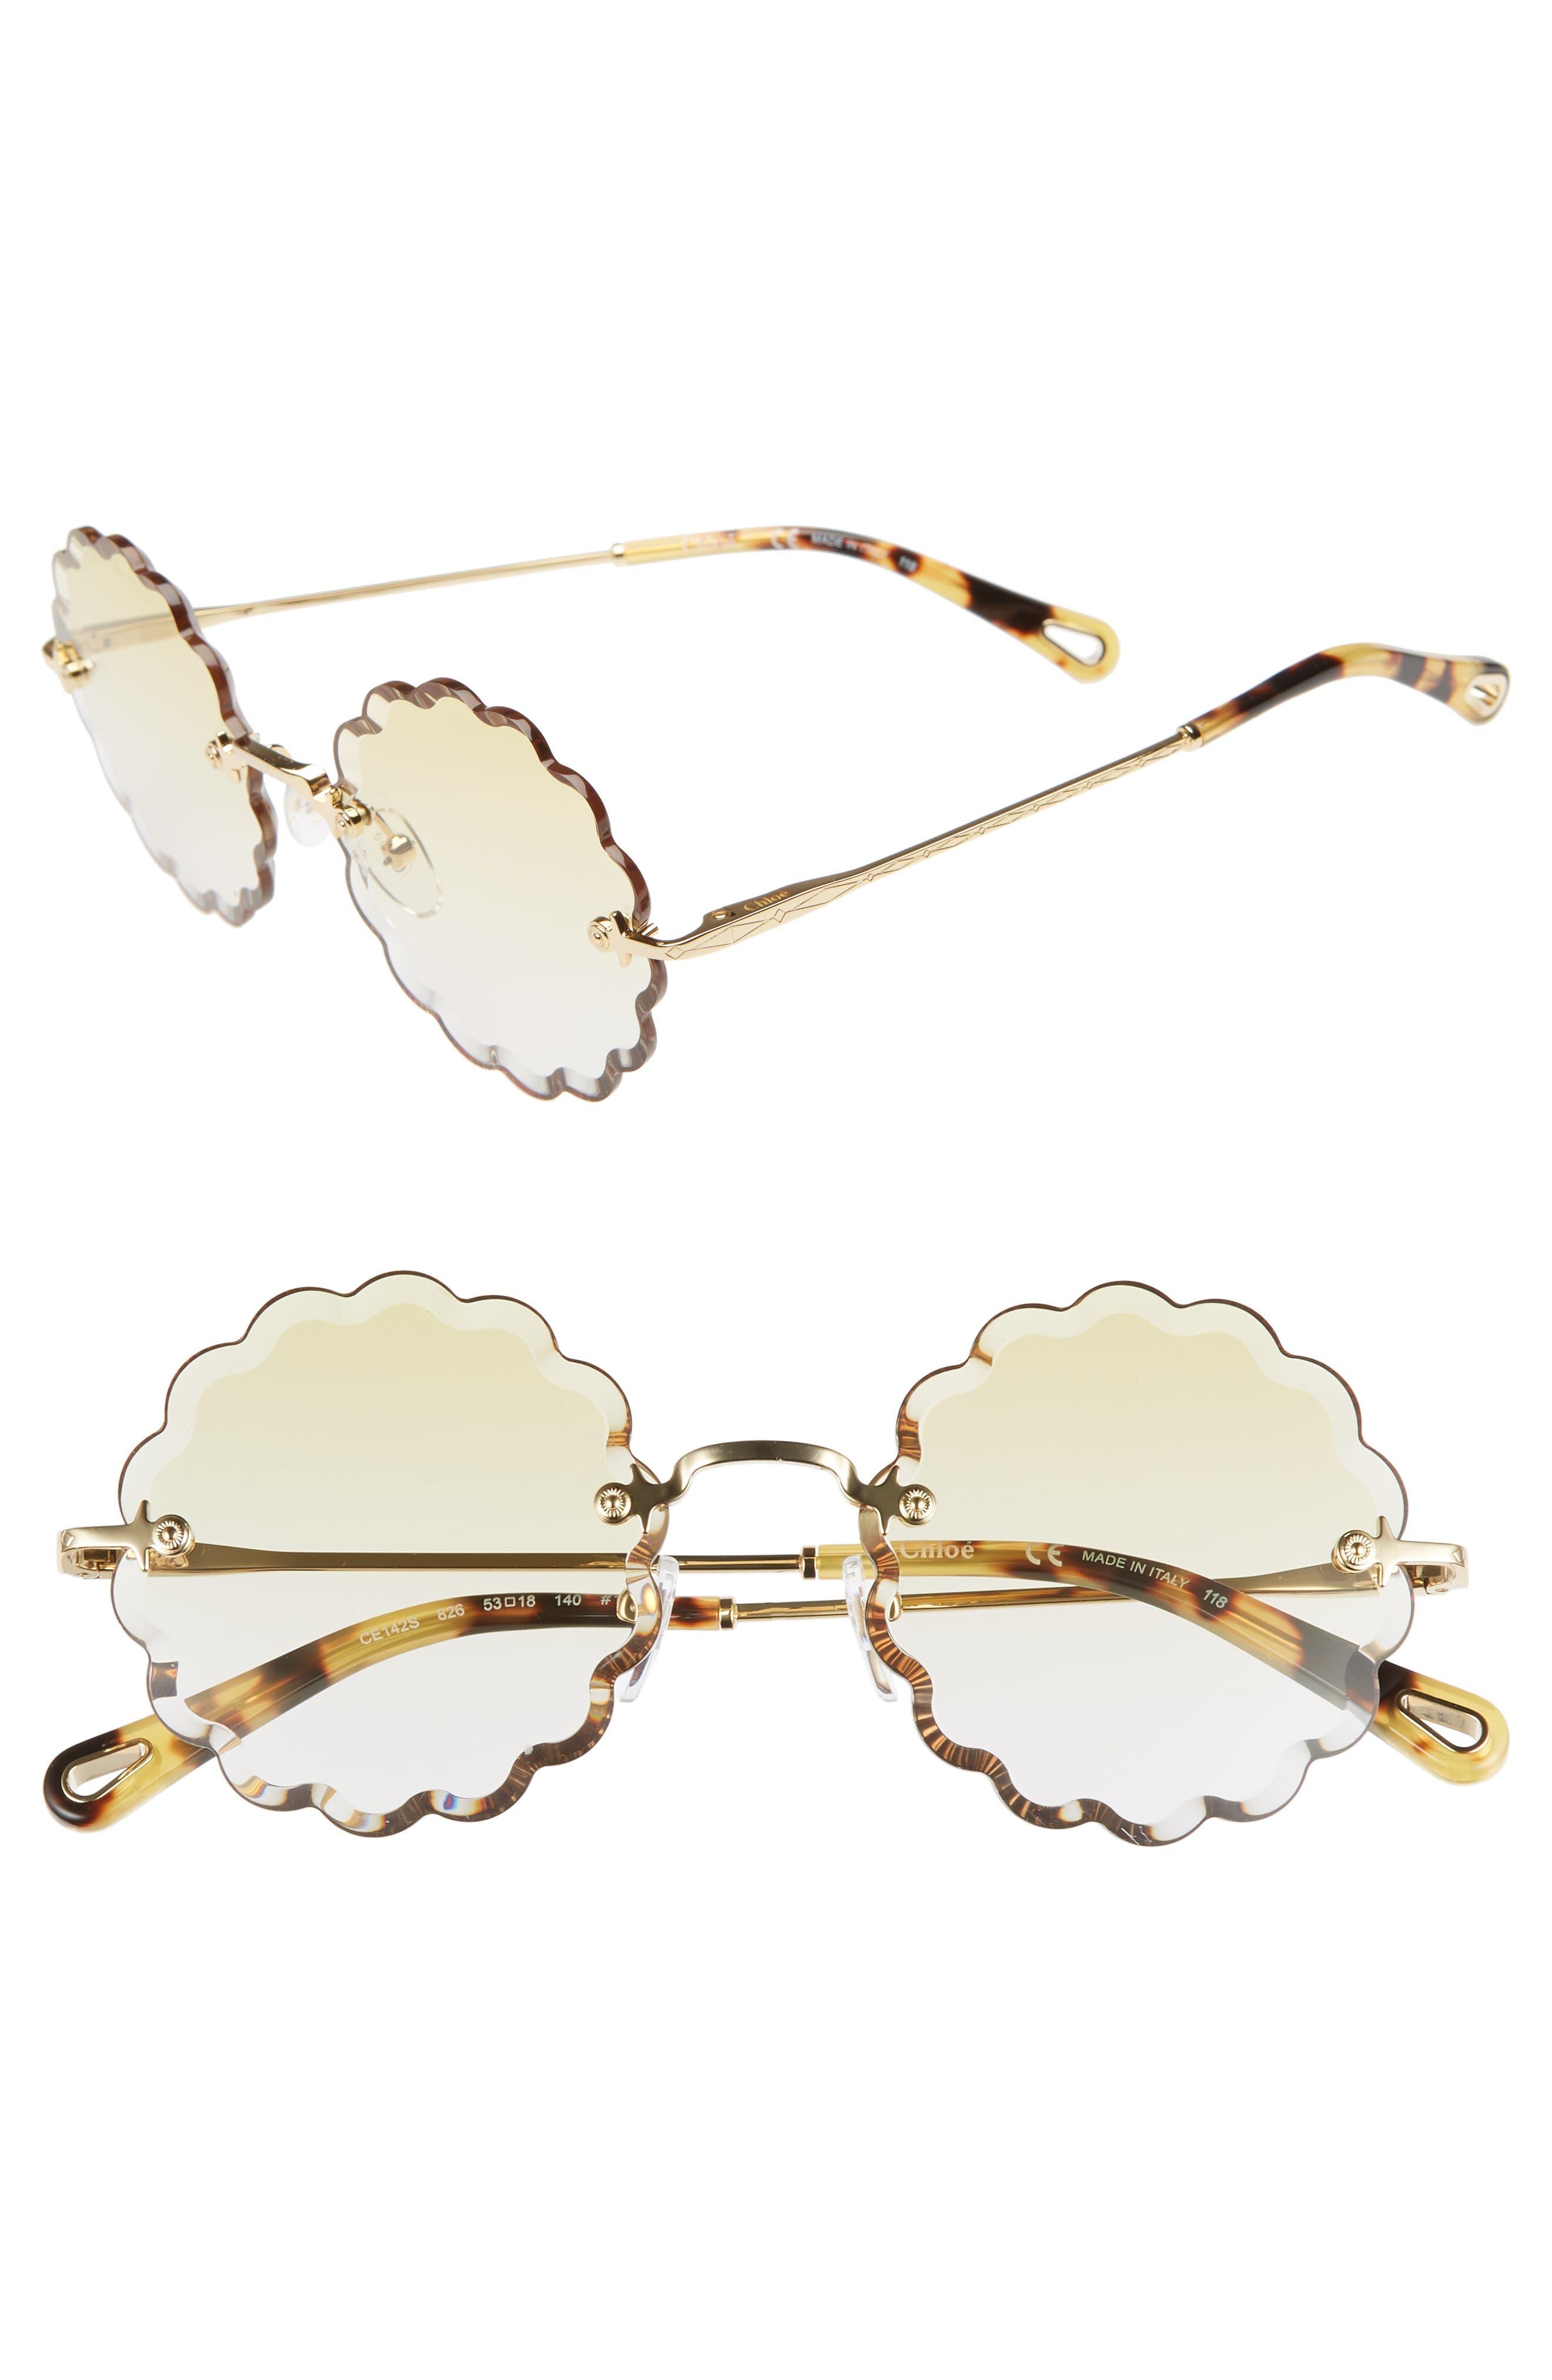 Chloe Rosie 5m Scalloped Sunglasses - Gold/ Gradient Yellow